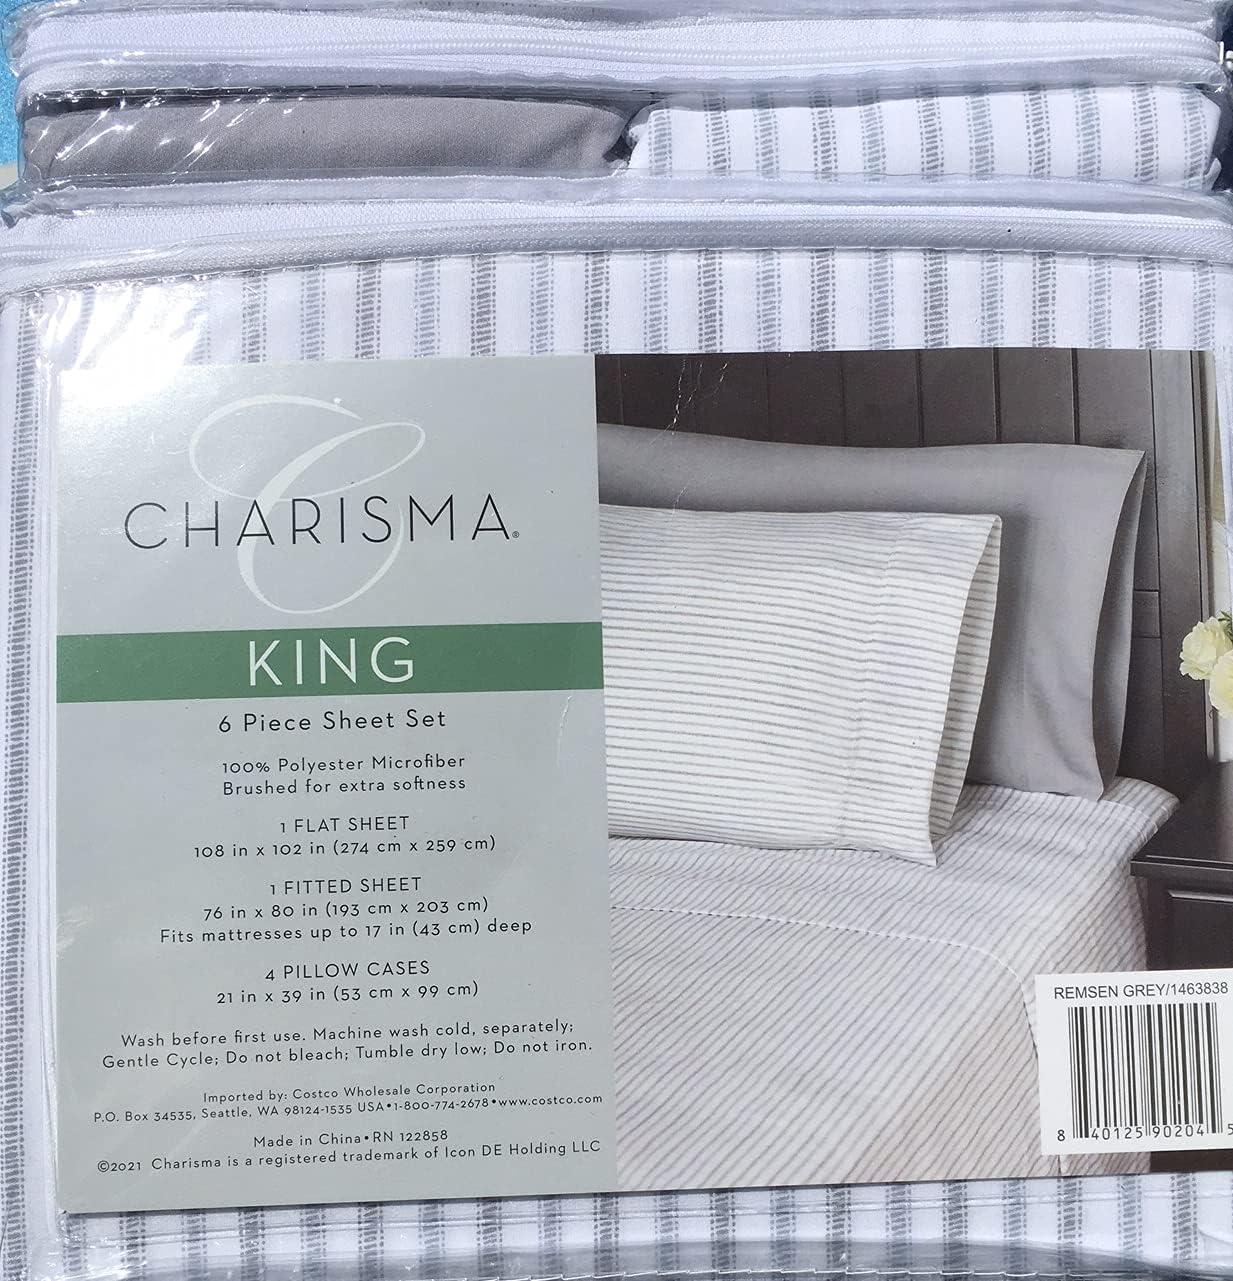 CMA Charisma Microfiber King 6-Piece Set Sheet Columbus Mall Remsen Industry No. 1 Brush Grey